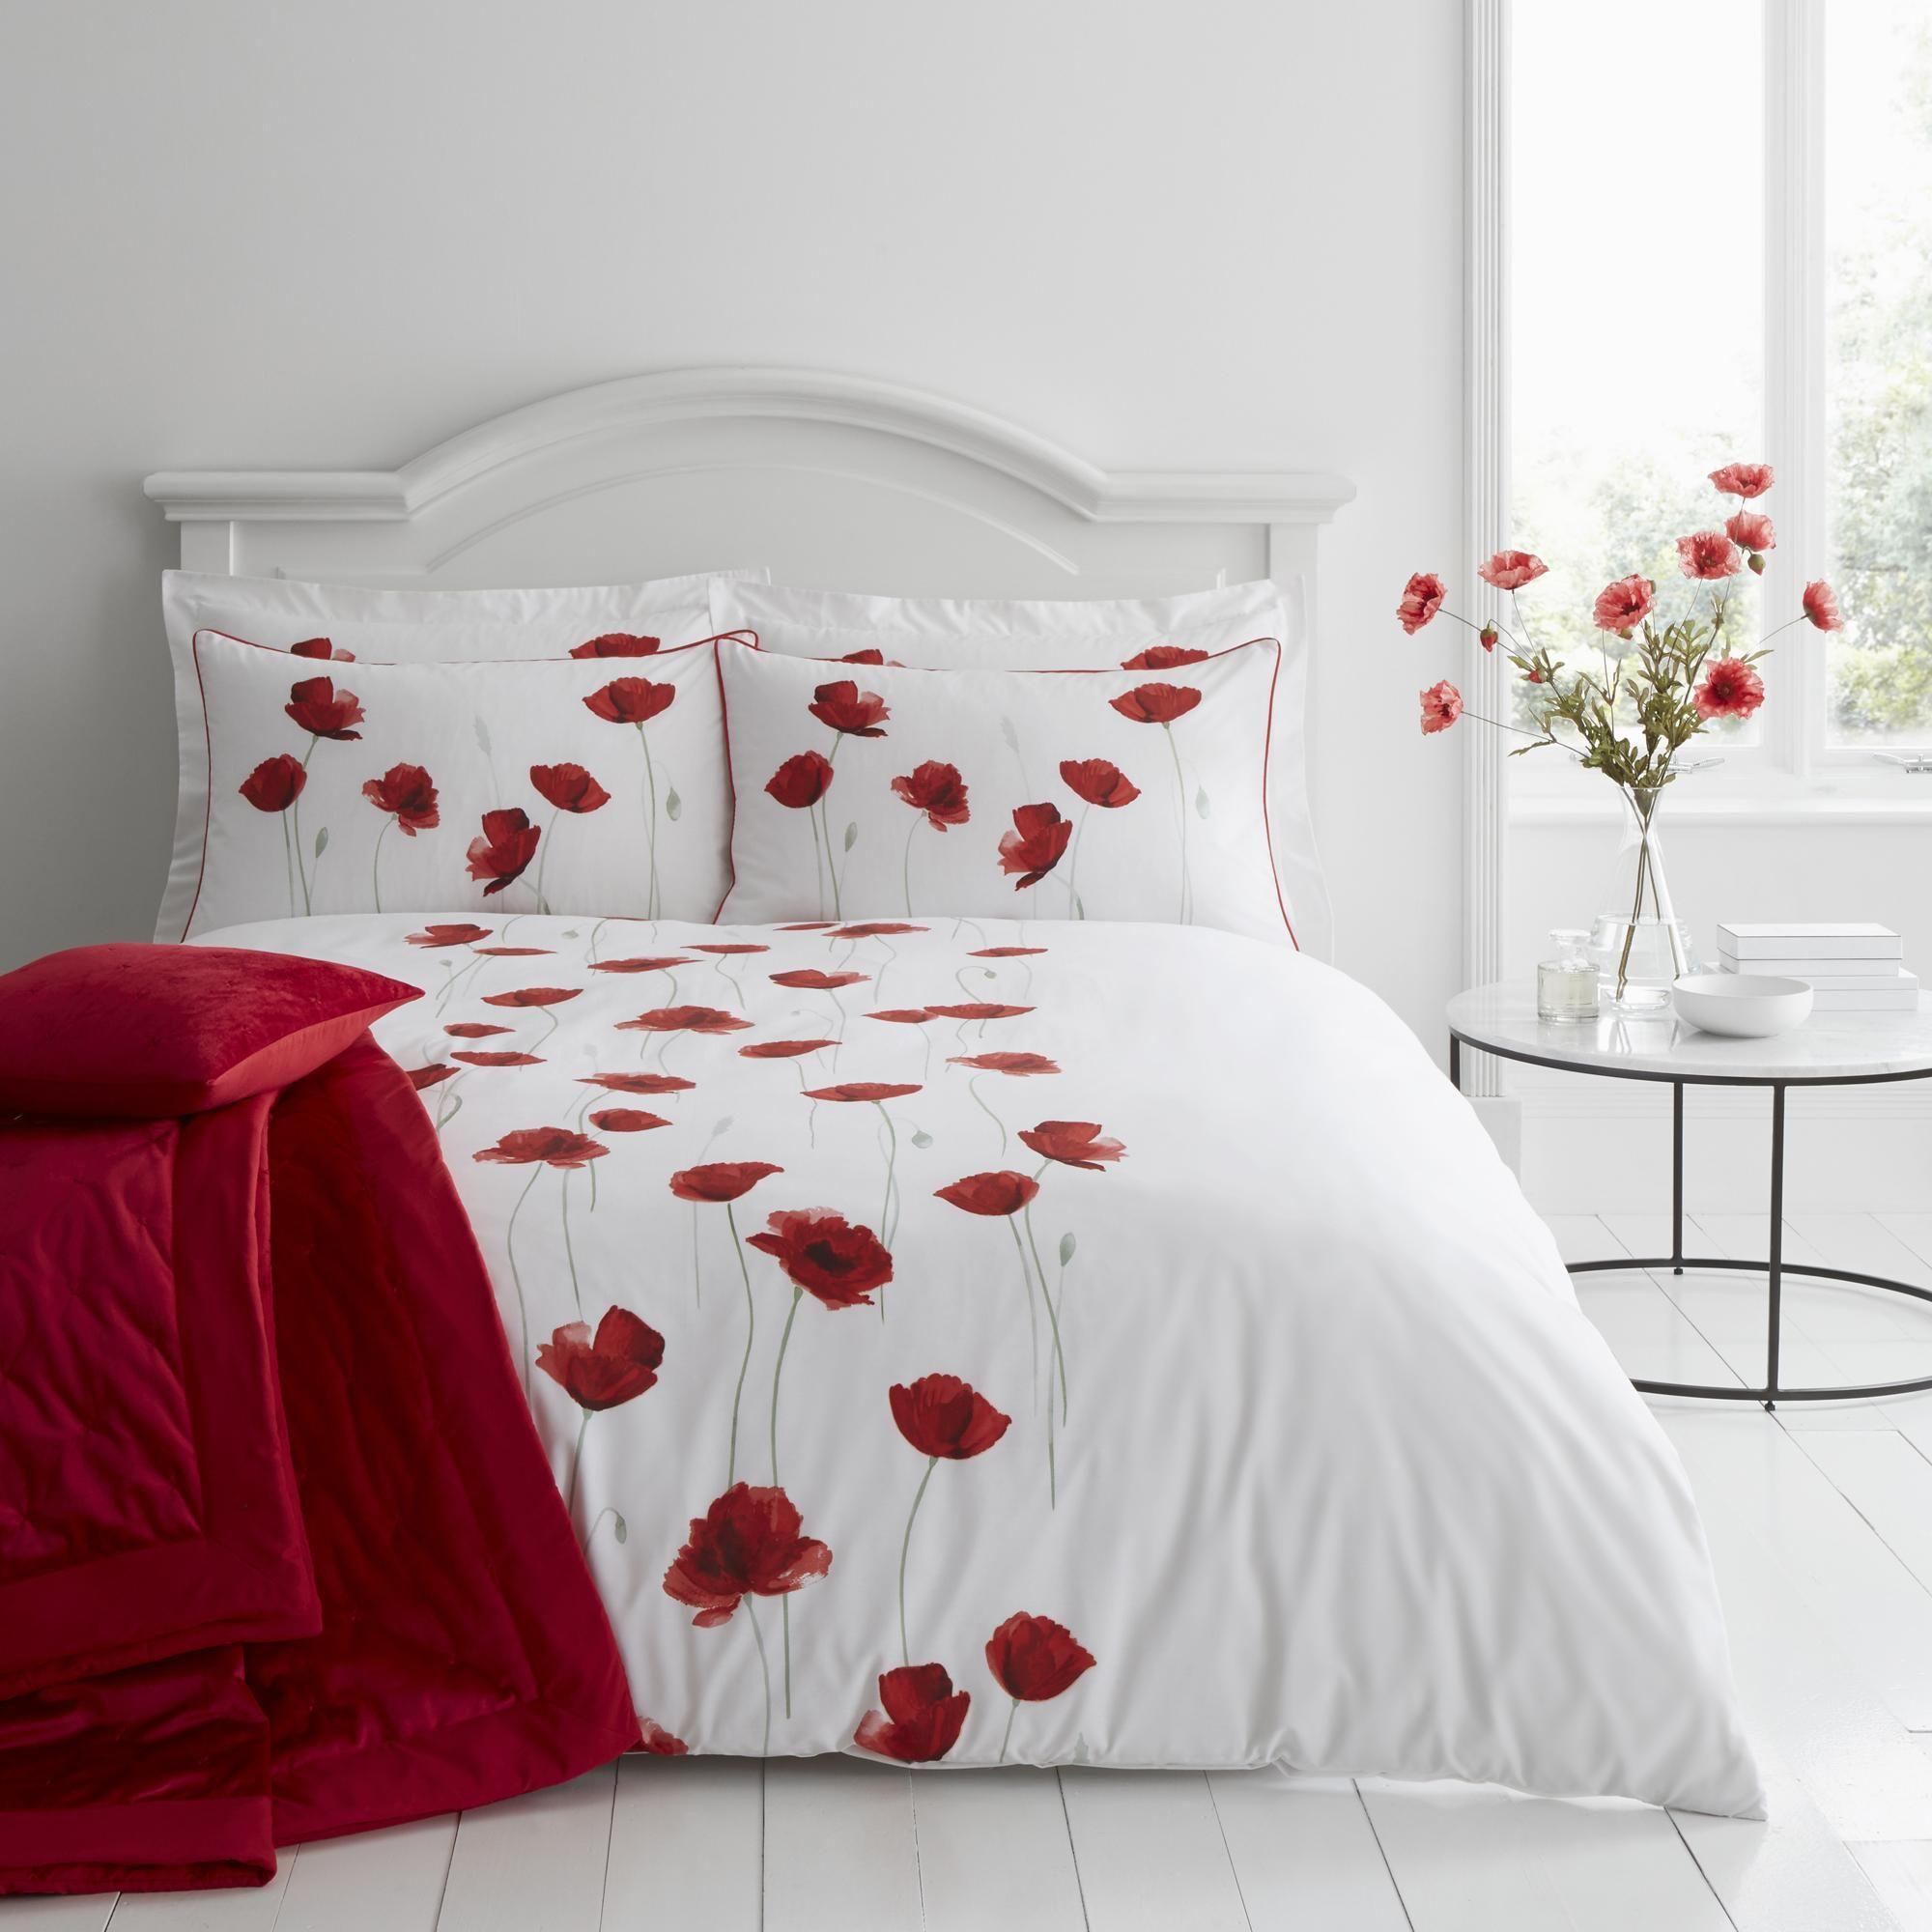 Poppy Trail Red Duvet Cover And Pillowcase Set In 2020 Red Duvet Red Duvet Cover